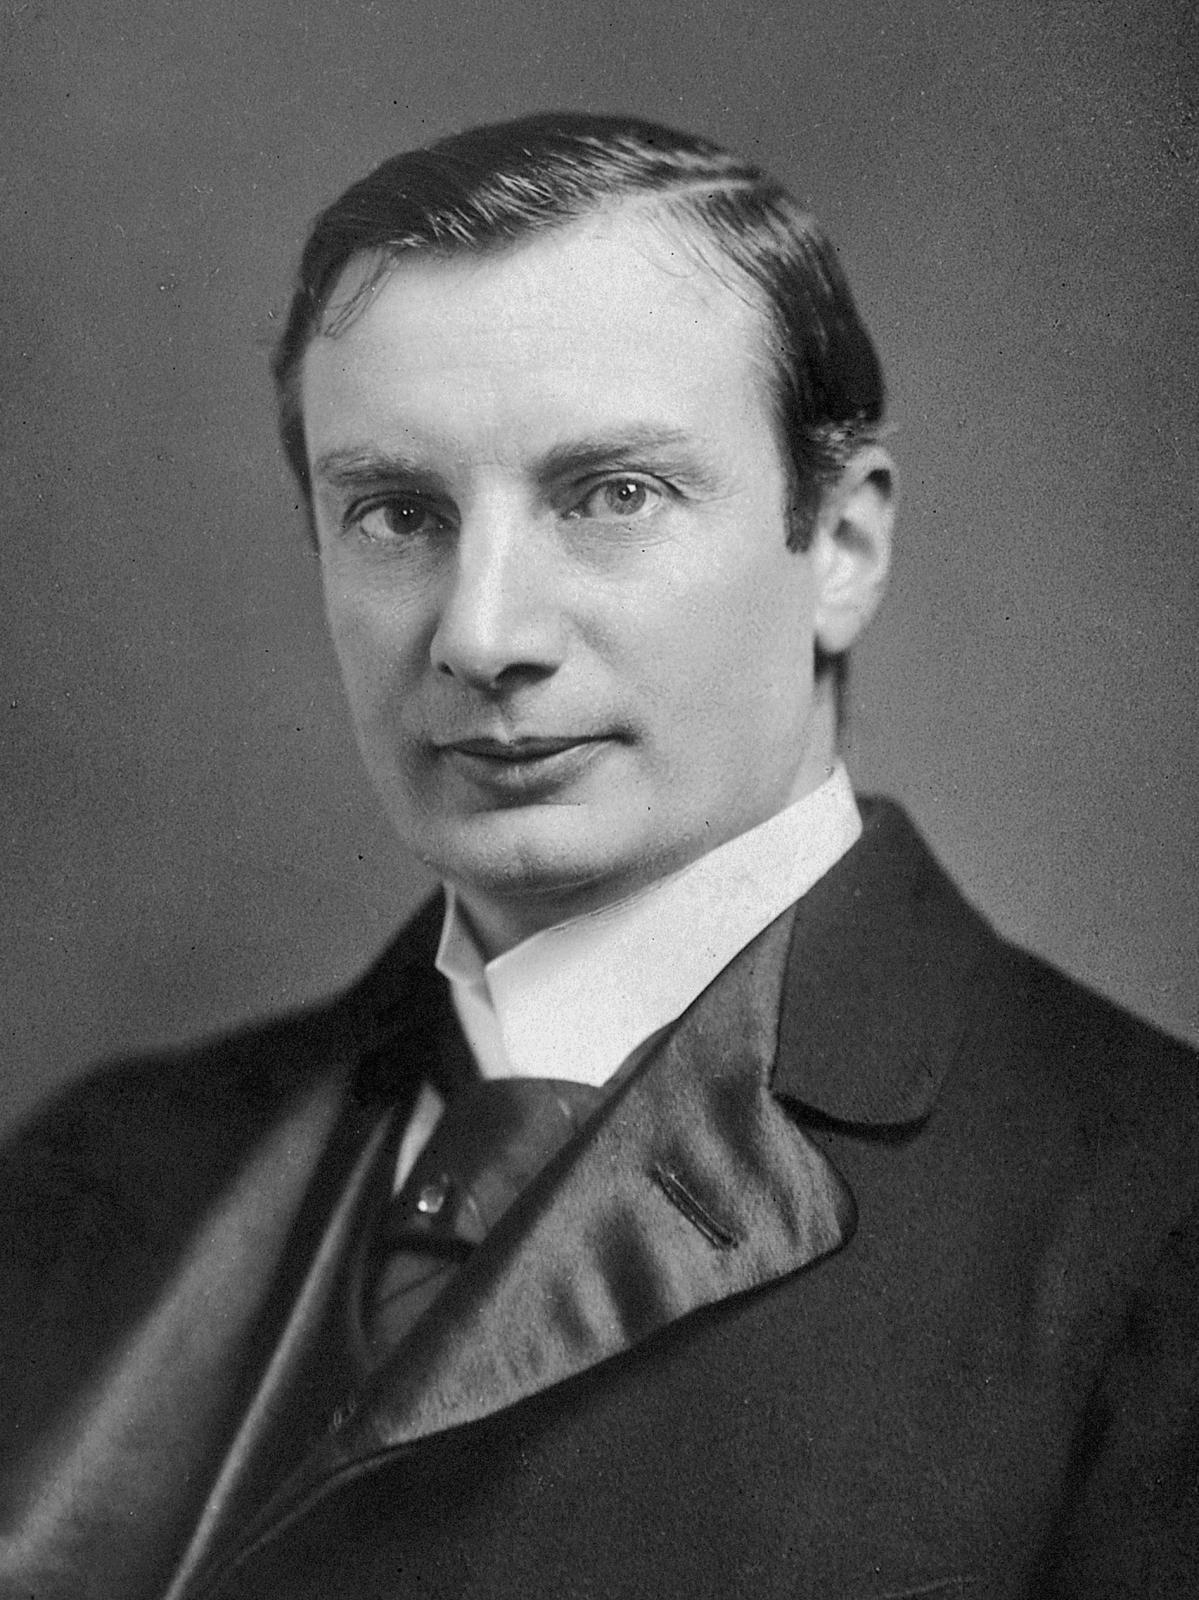 Bacteriologist Waldemar Mordecai Haffkine